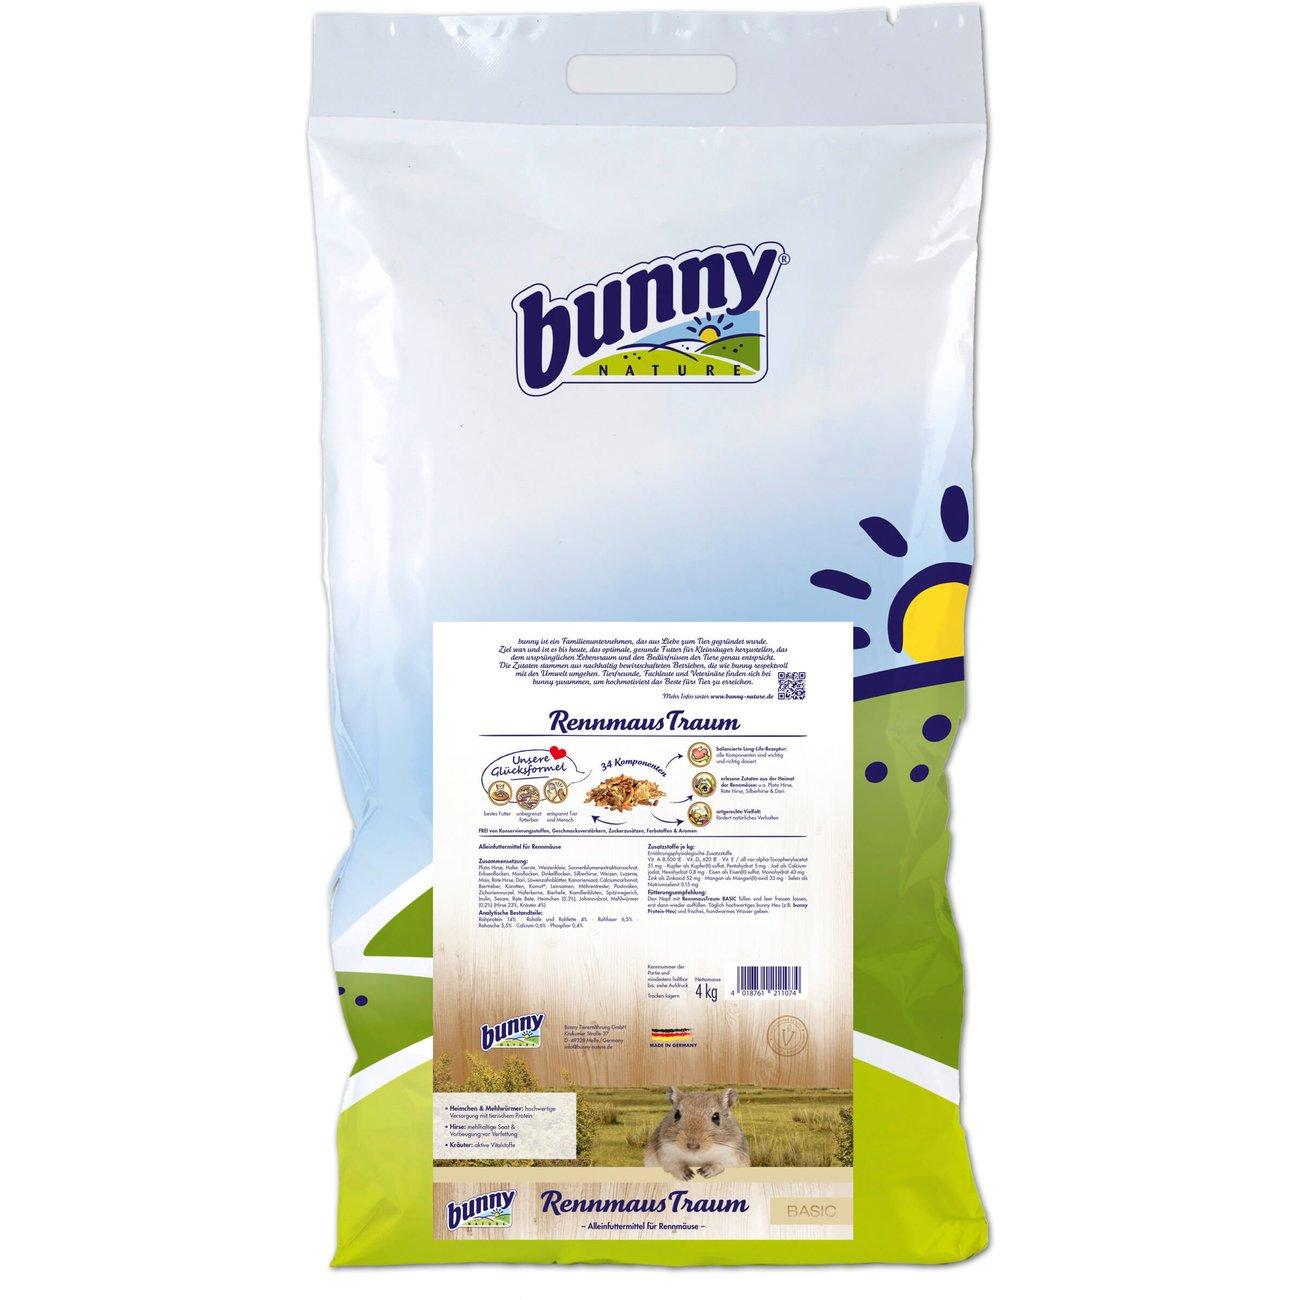 Bunny RennmausTraum basic, 4 kg